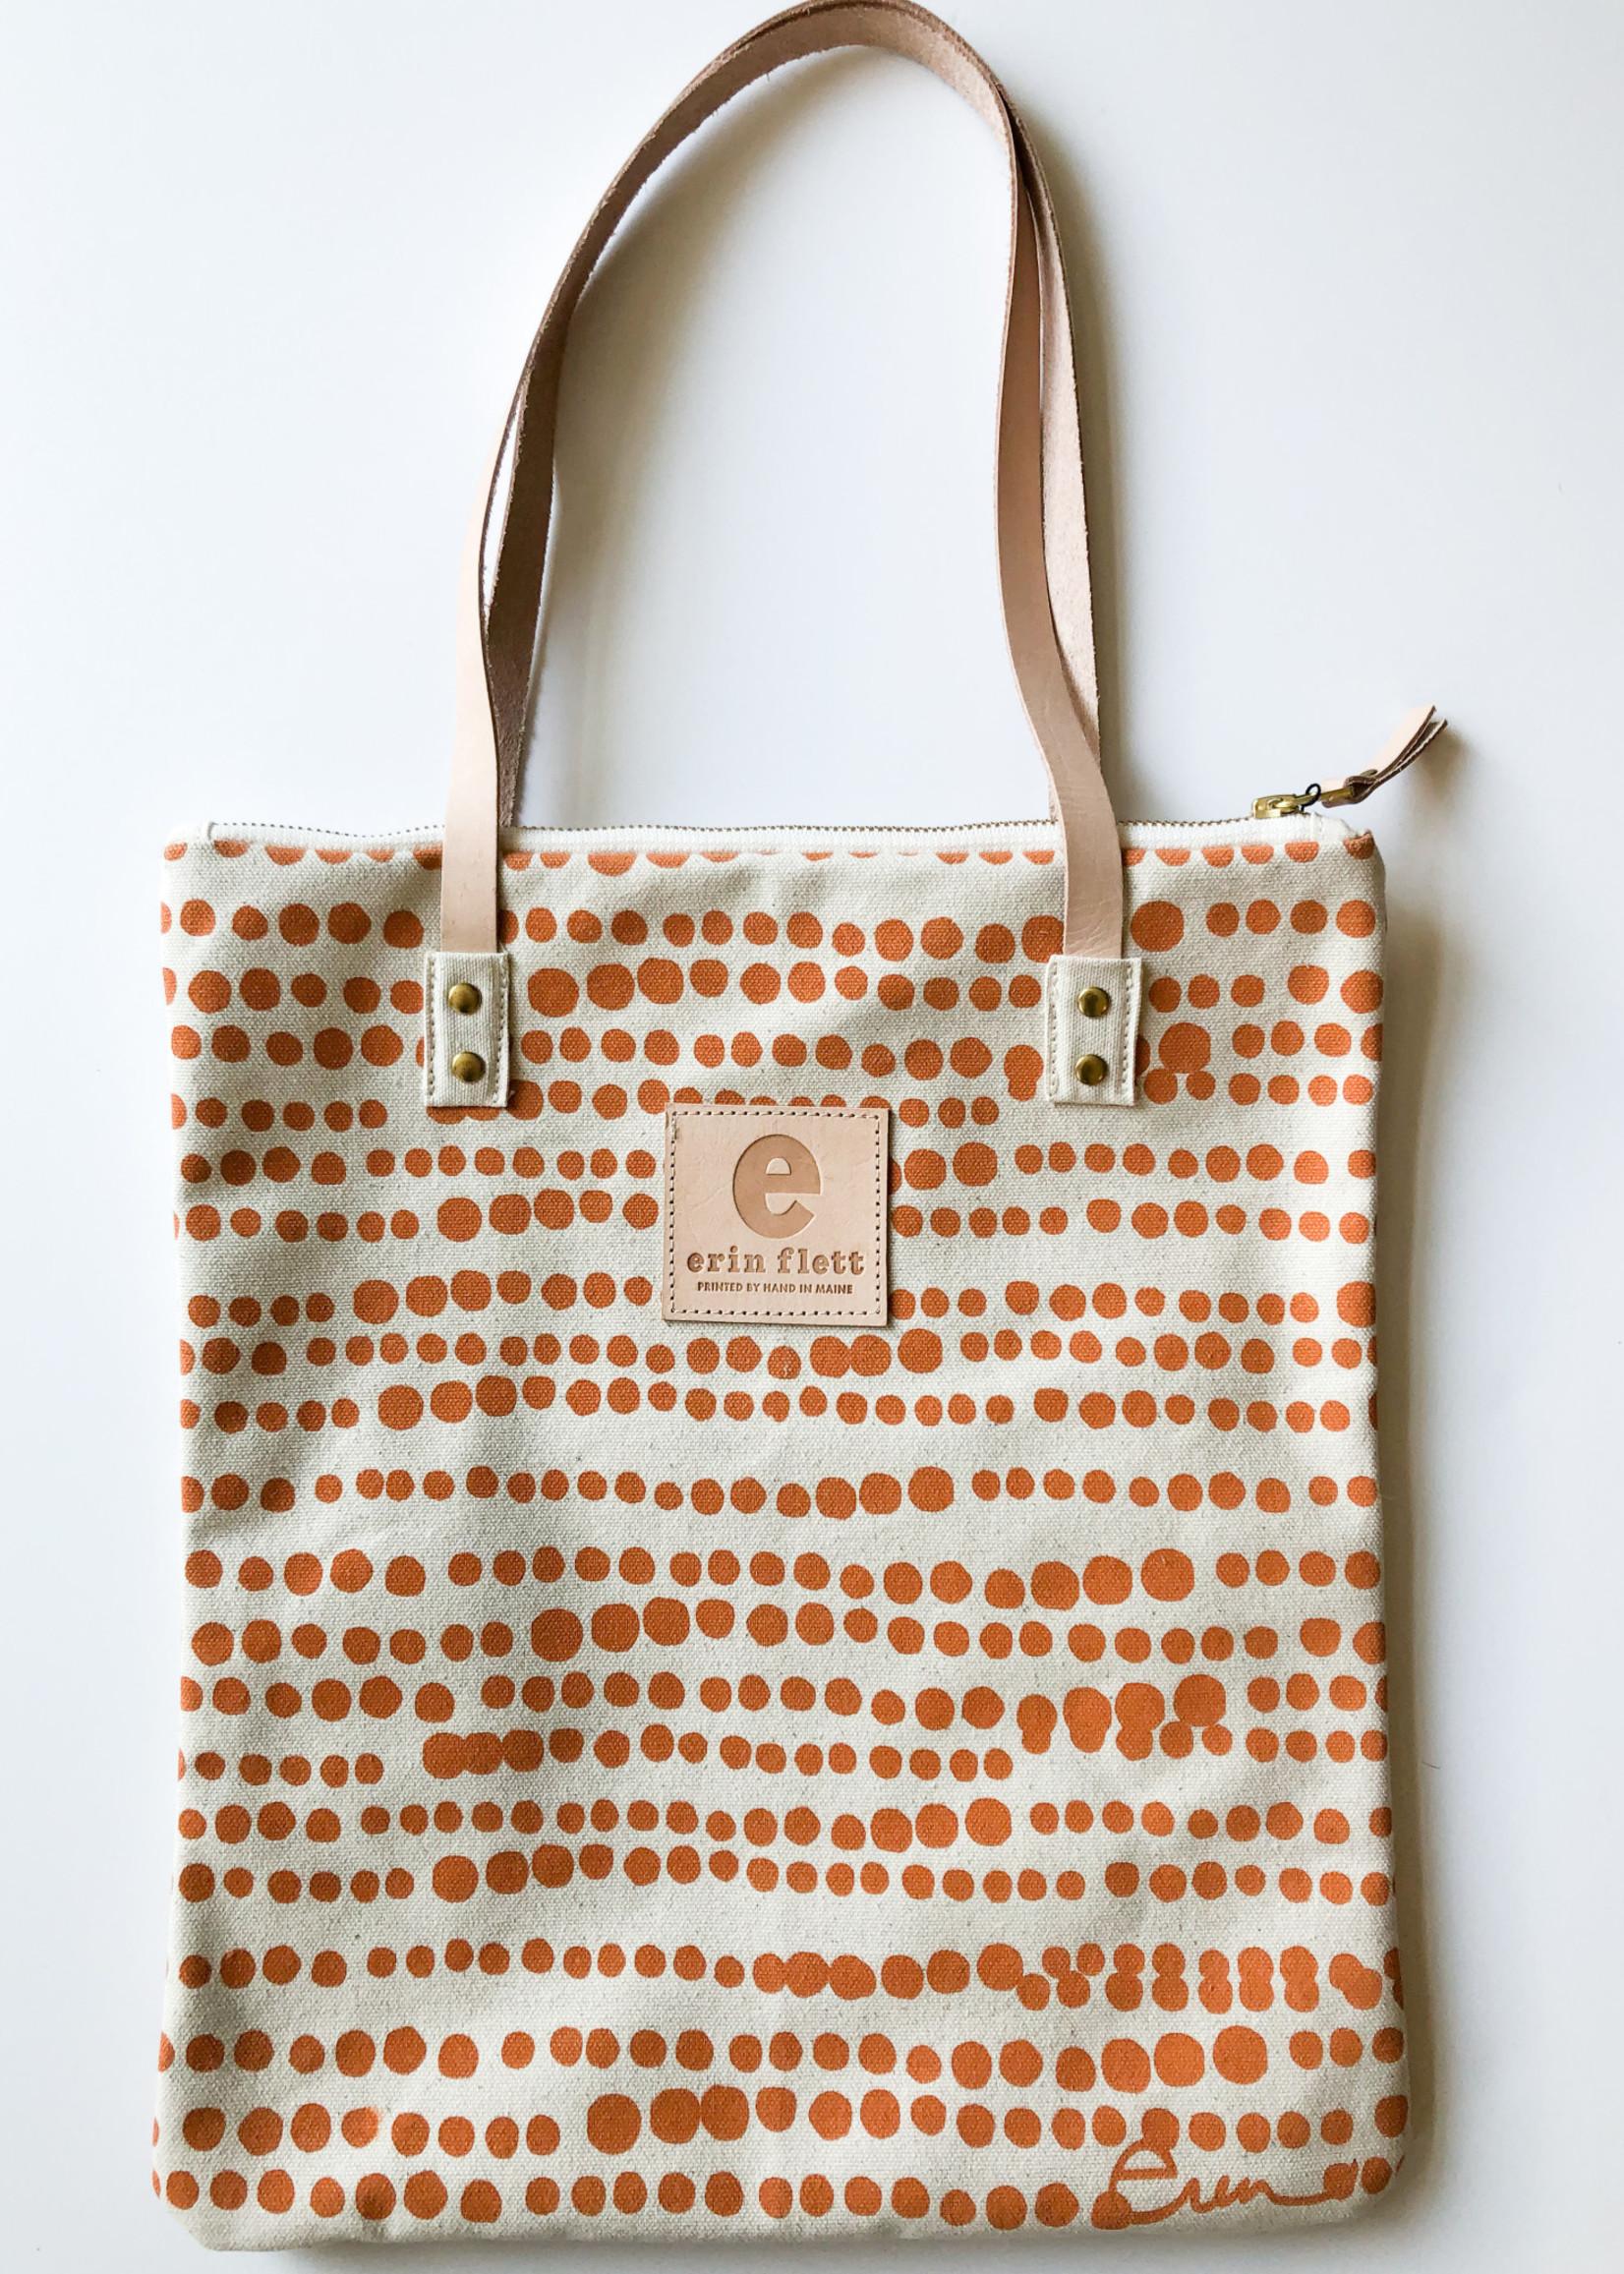 Erin Flett Mango Hilary Mod Tote Bag